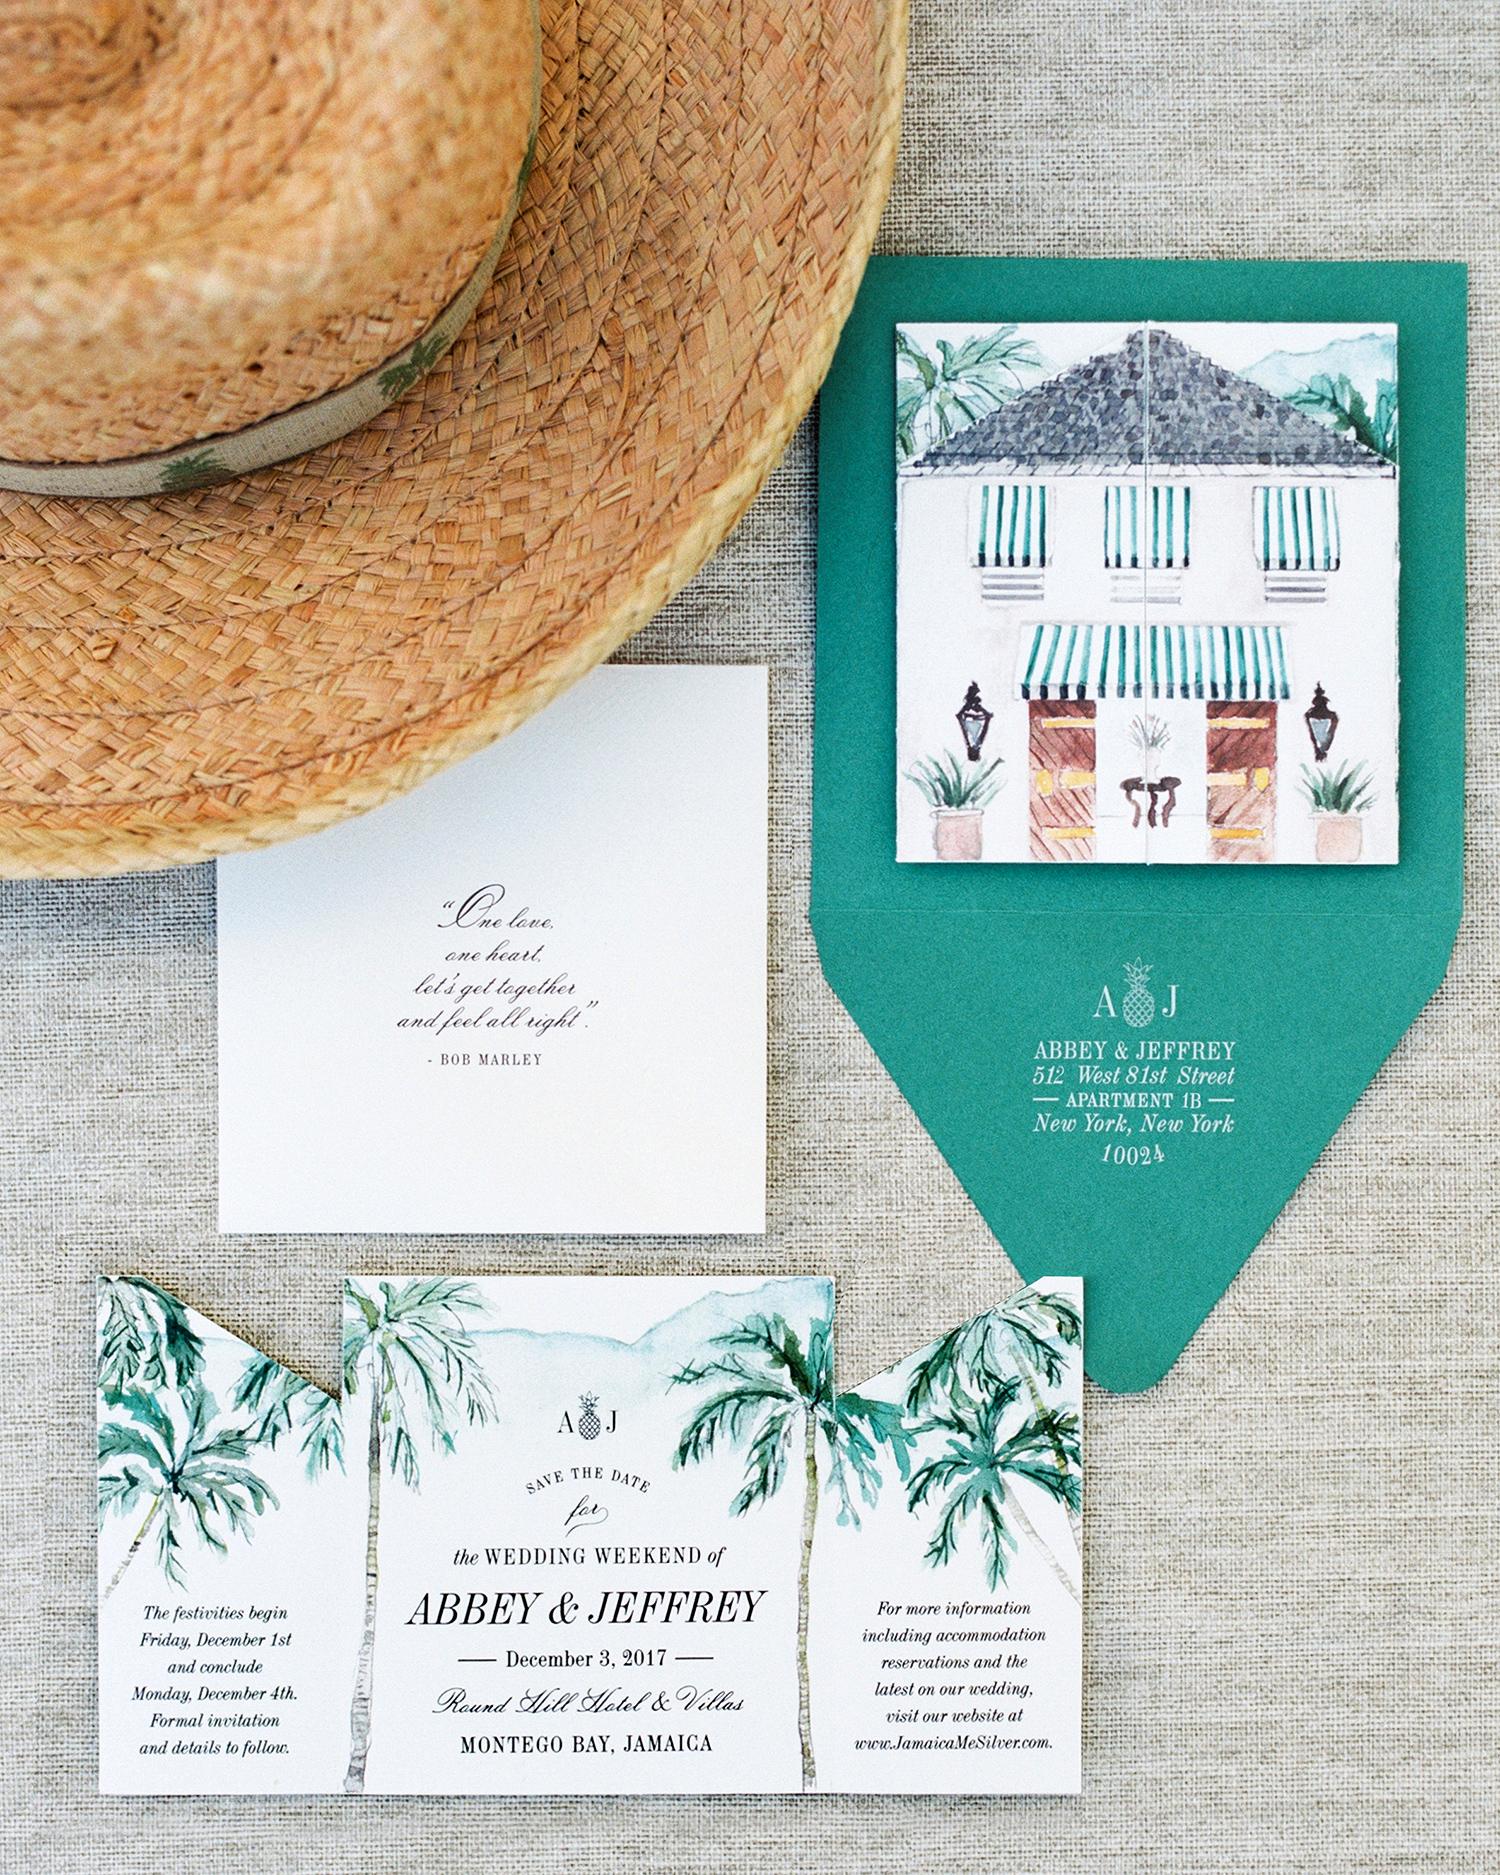 abbey jeffrey wedding tropical save-the-dates jamaica